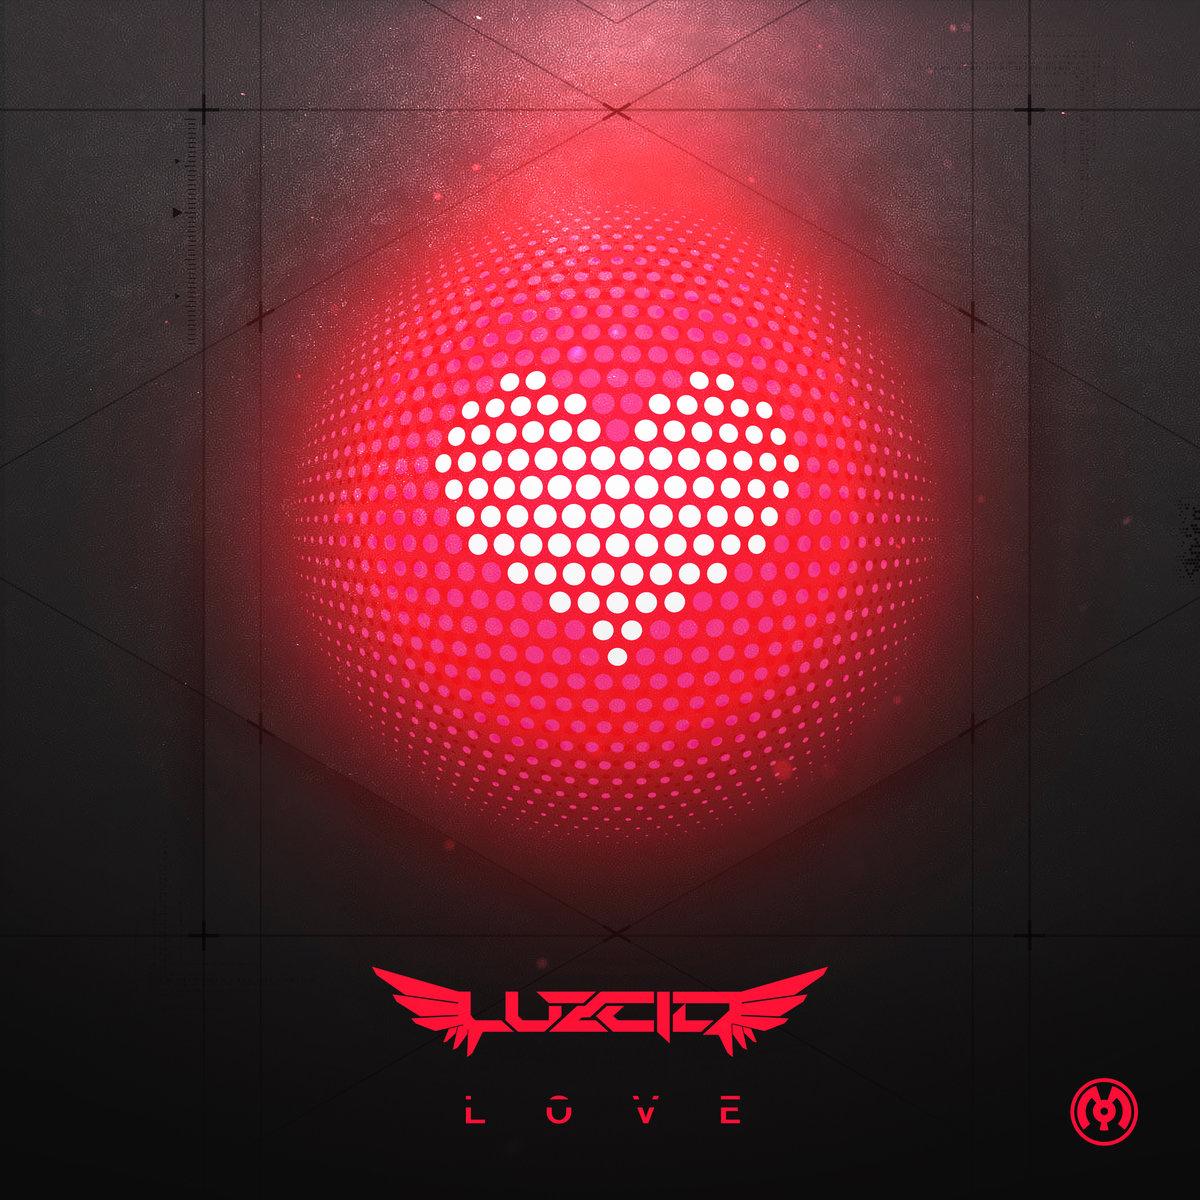 Luzcid - Love